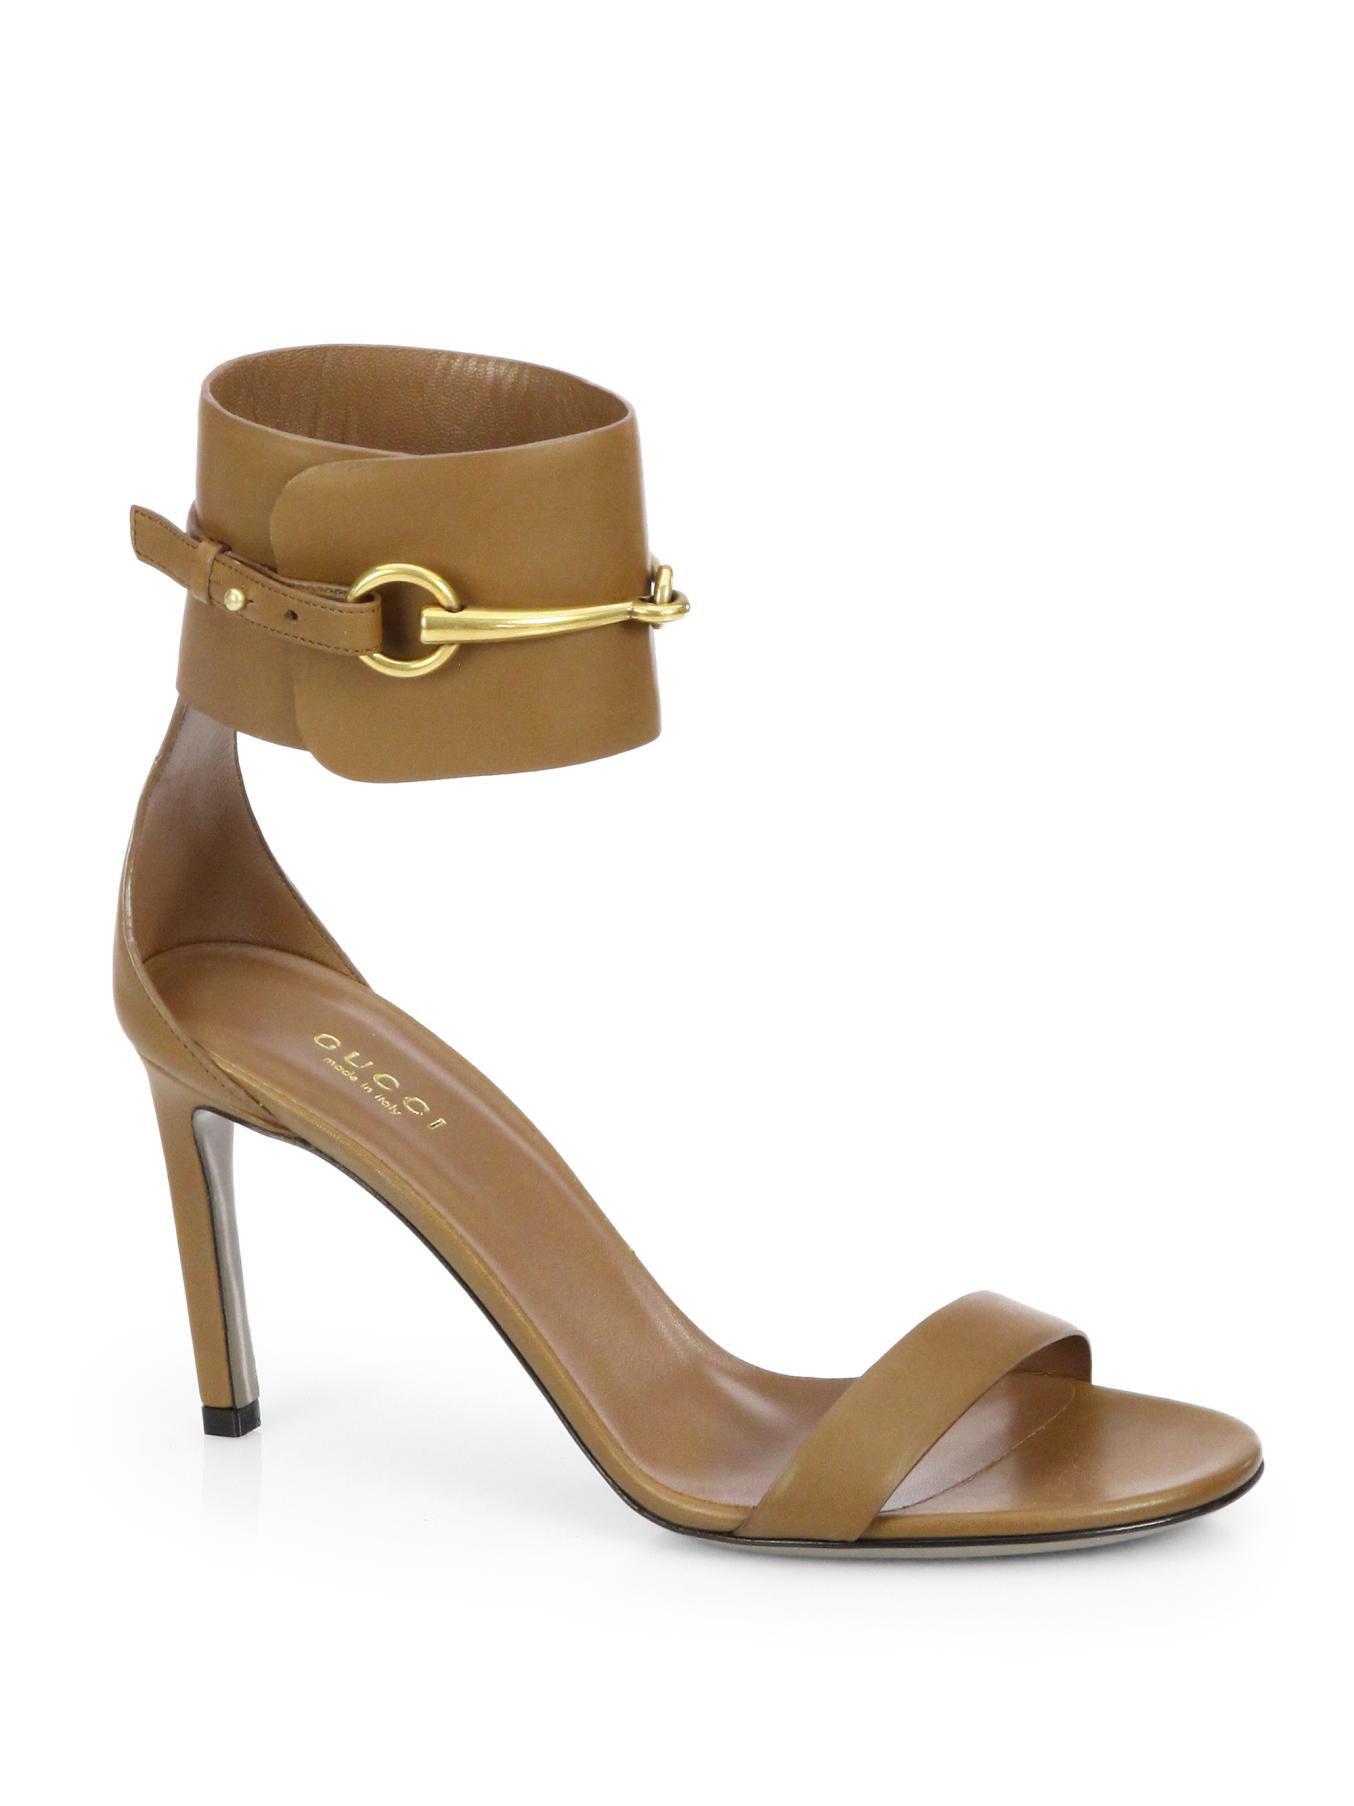 a74cc4a7f678 Lyst - Gucci Ursula Leather Horsebit Sandals in Brown